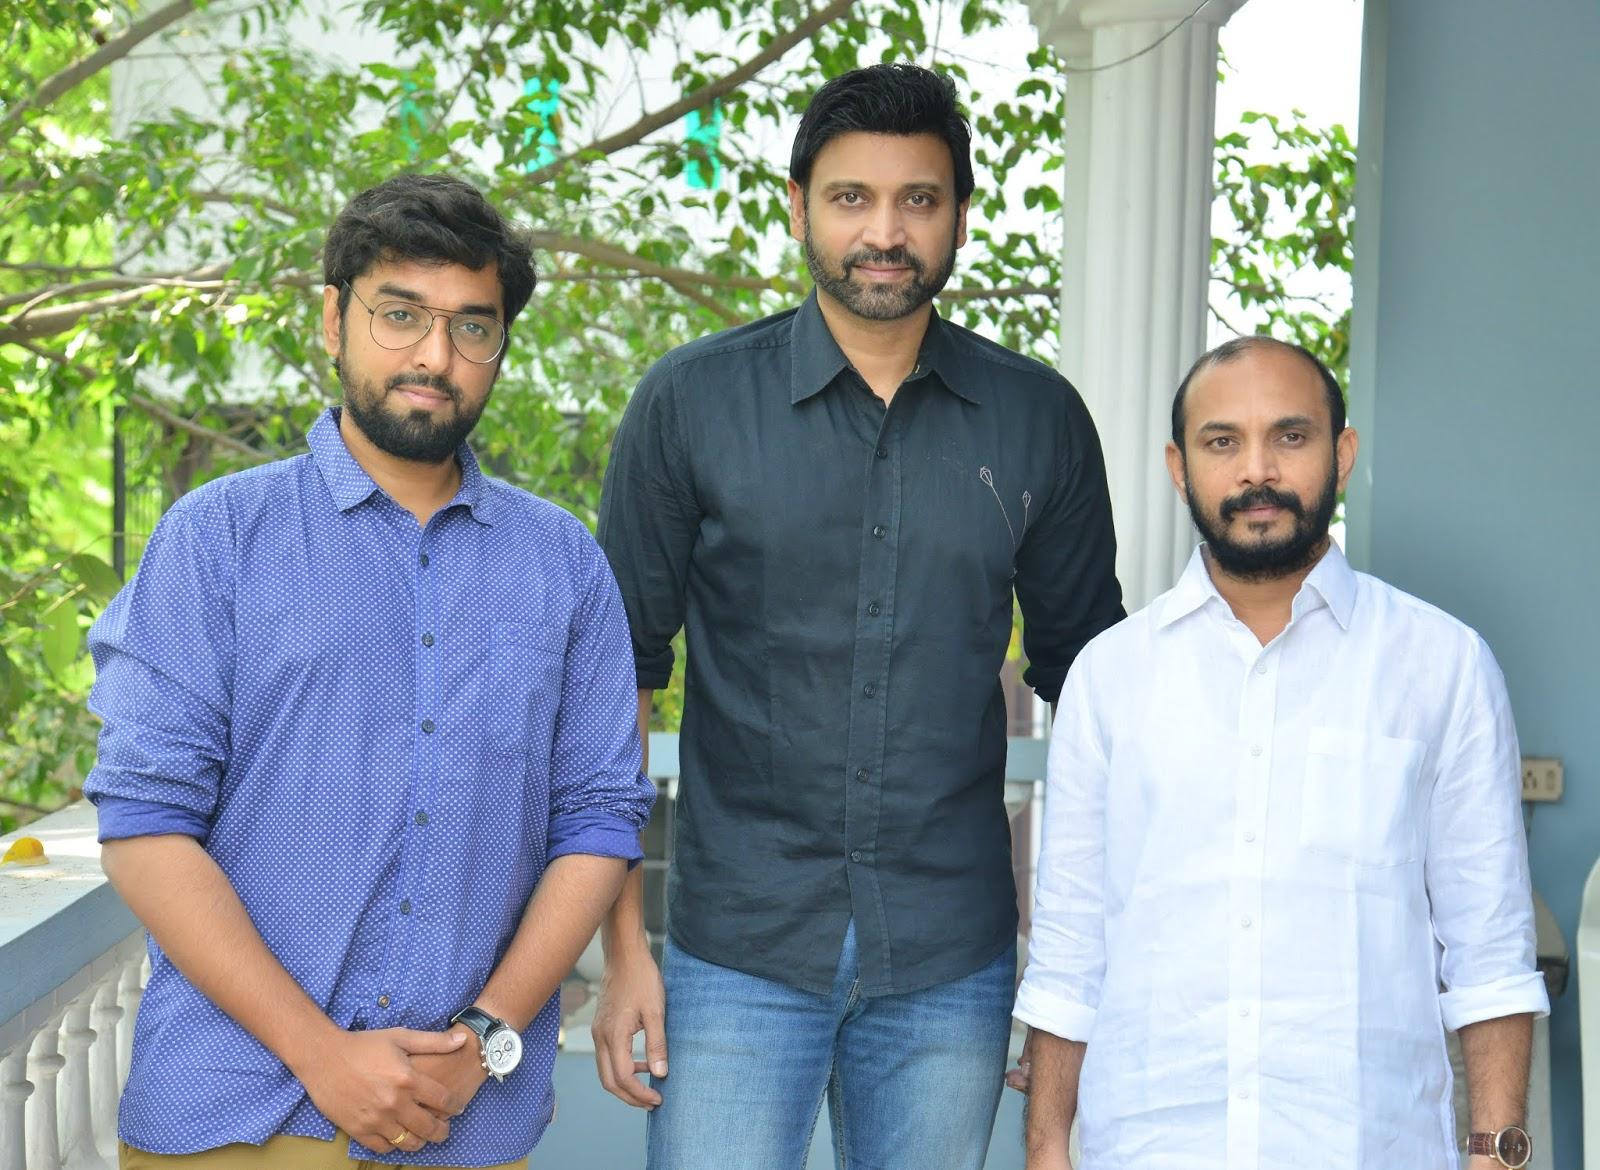 Santhosh Jagarlapudi, Sumanth, Beeram Sudhakar Reddy @ Subramaniapuram Movie Press Meet Stills